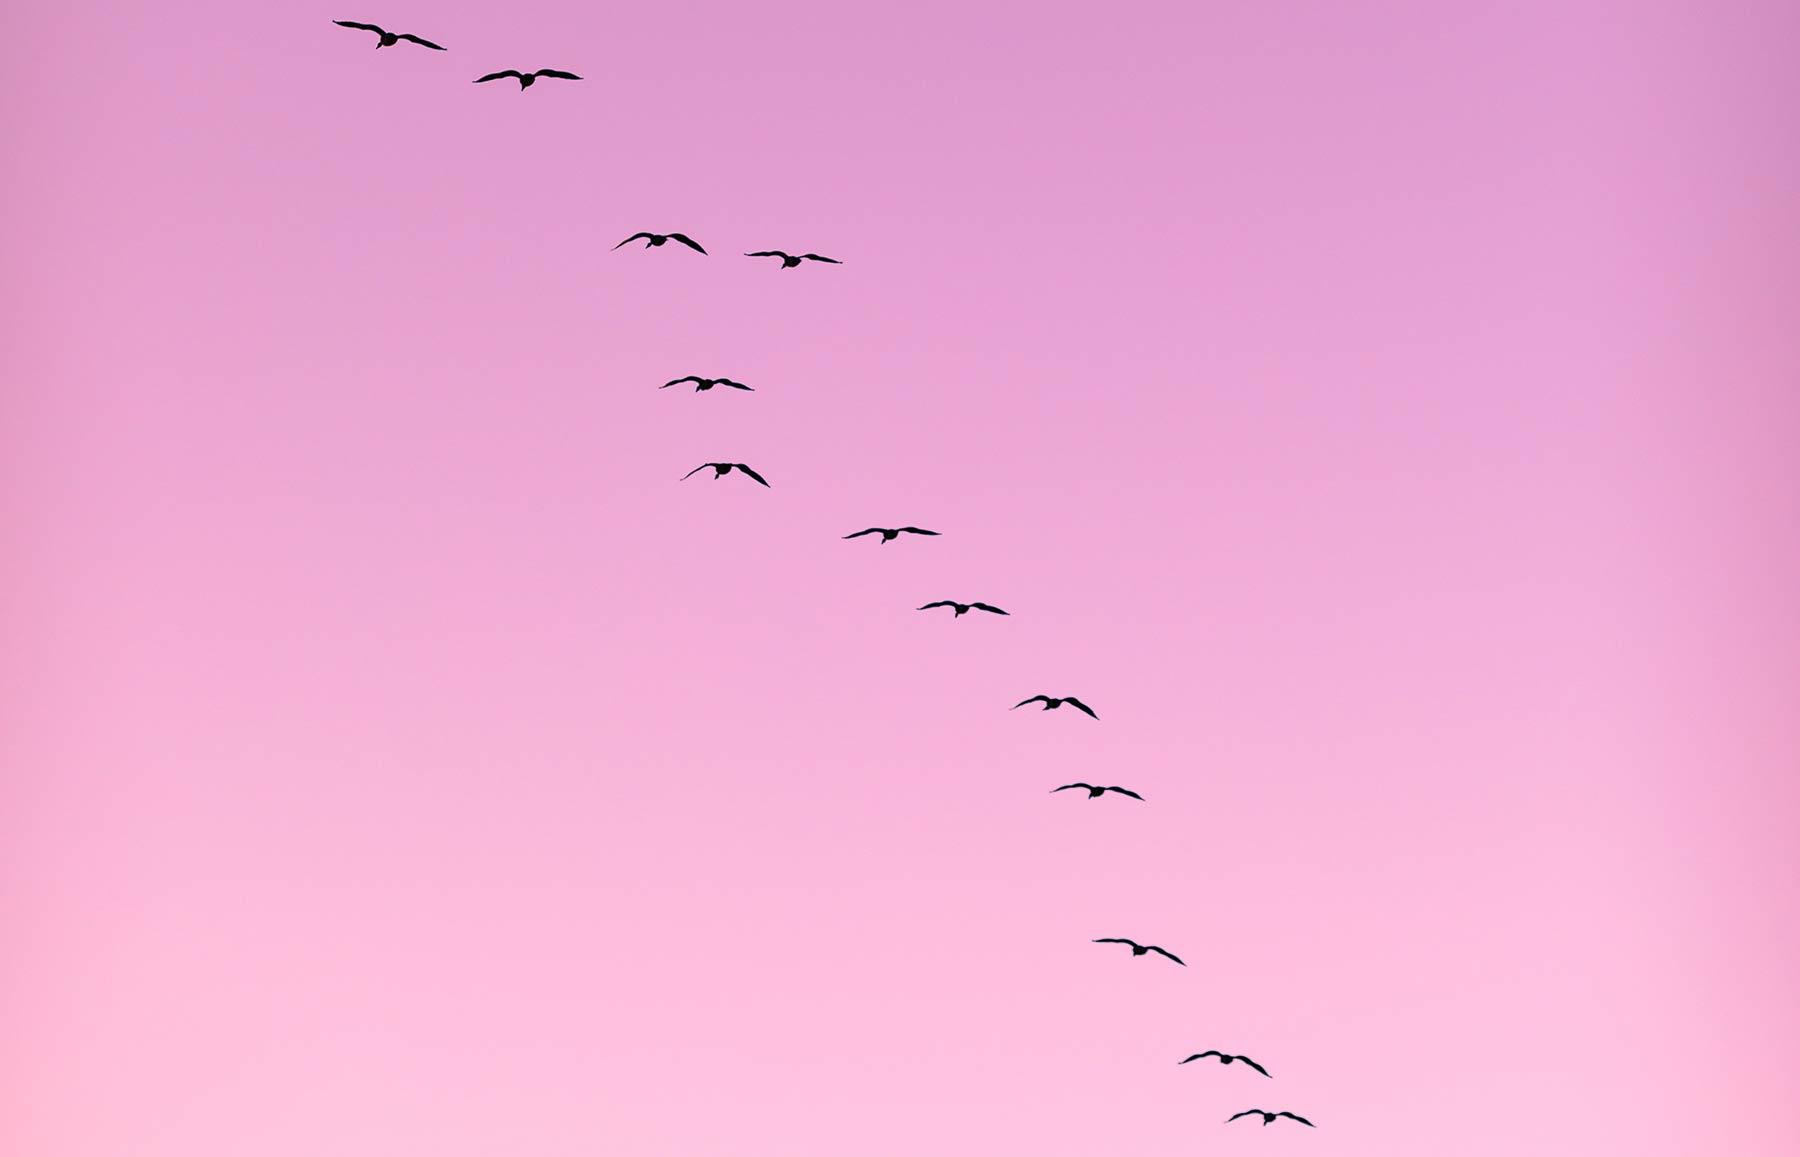 Migration patterns of birds explained